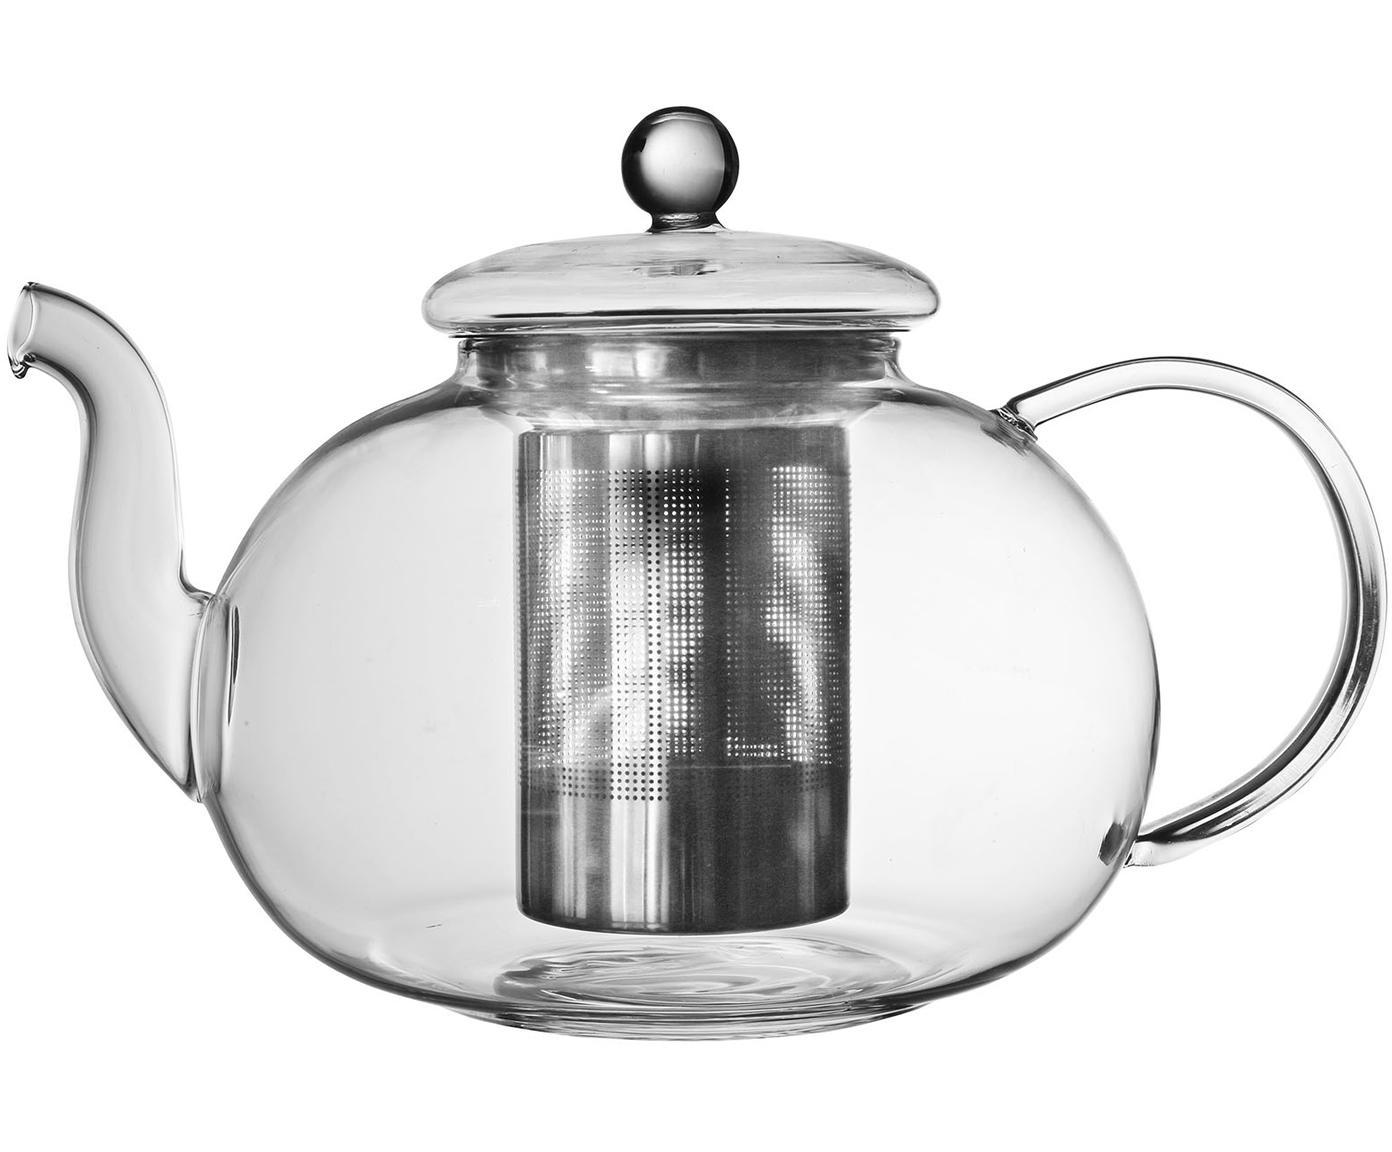 Tetera Argyle, Tetera: vidrio, Transparente, plateado, An 23 x Al 15 cm